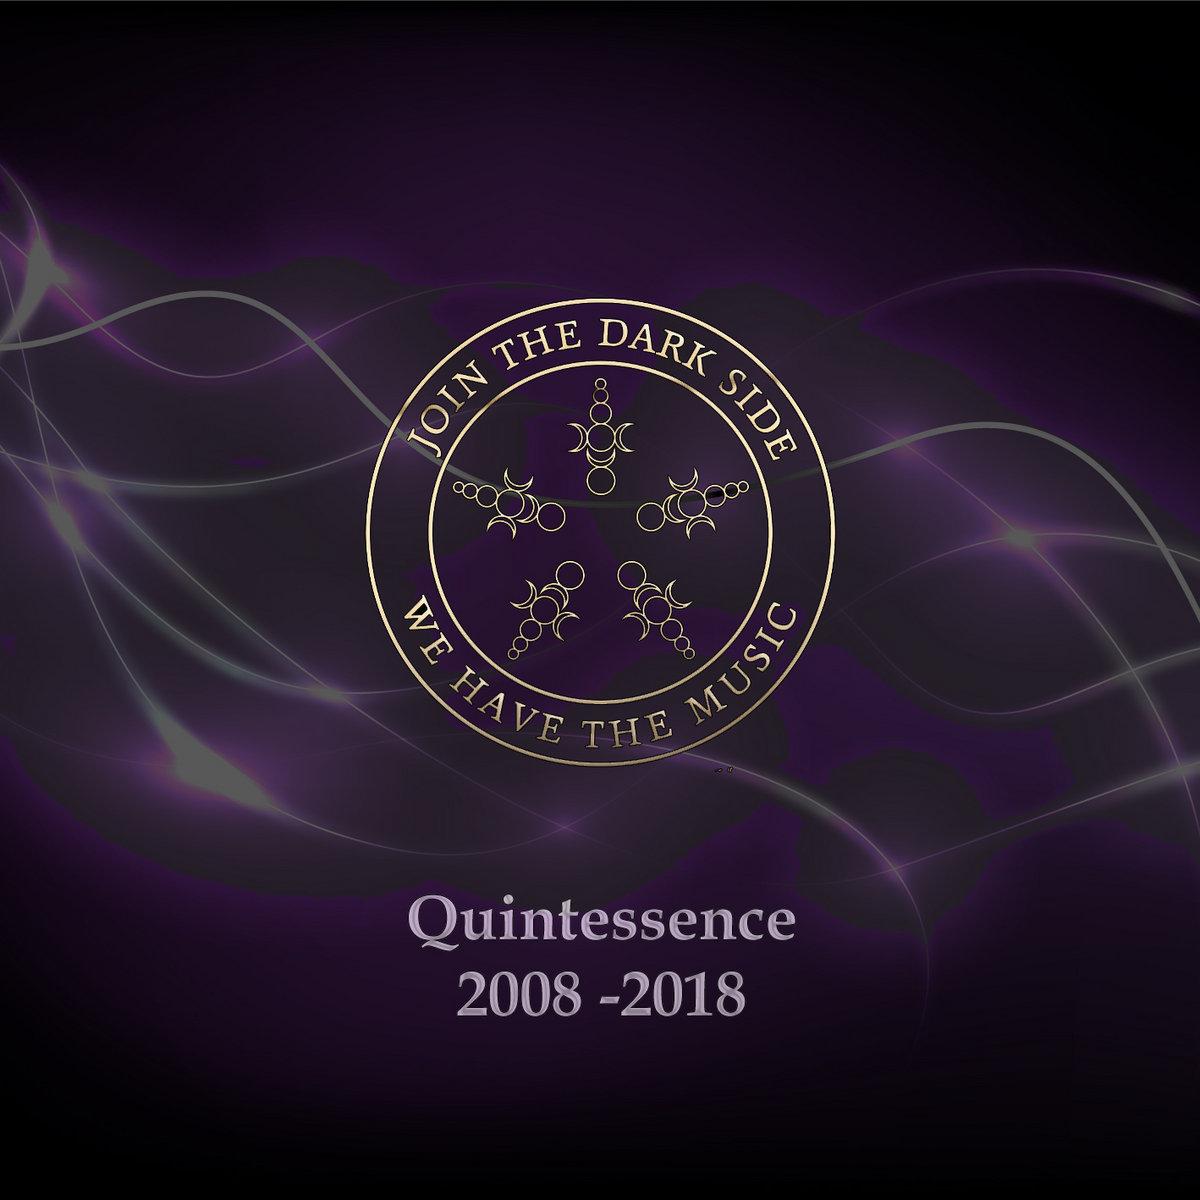 Quintessence 2008 – 2018